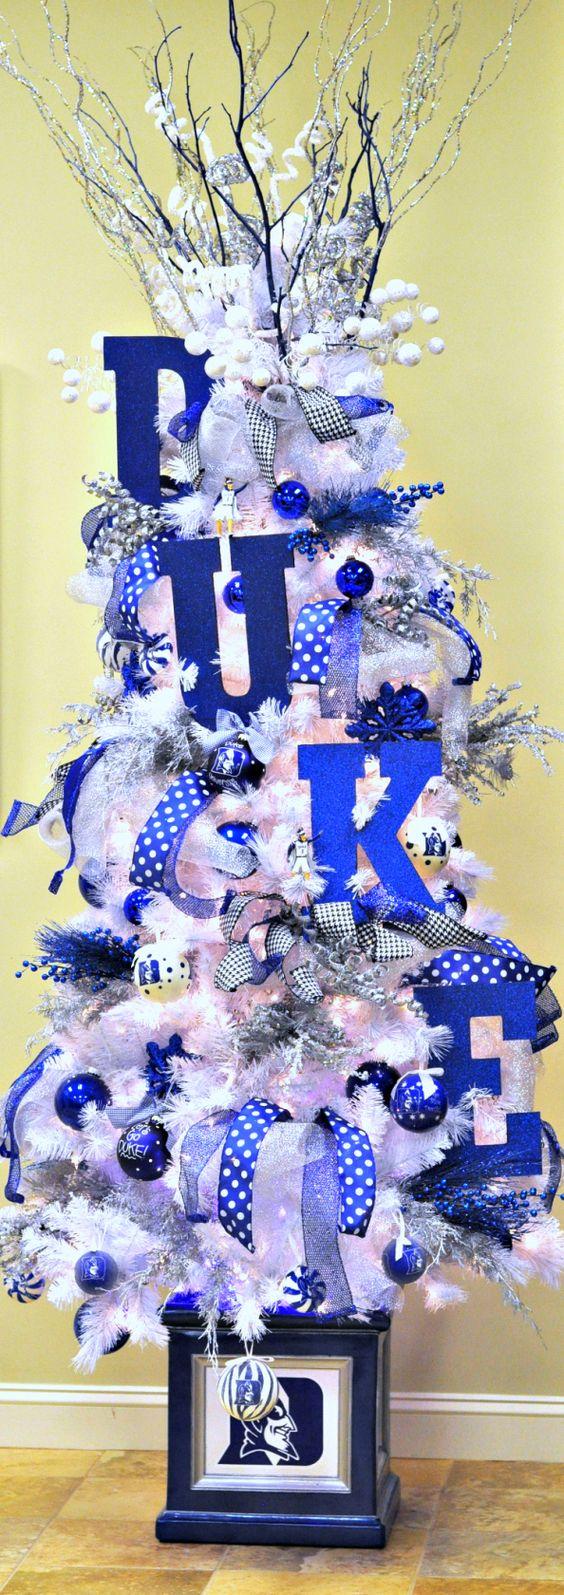 Duke University Christmas Tree!